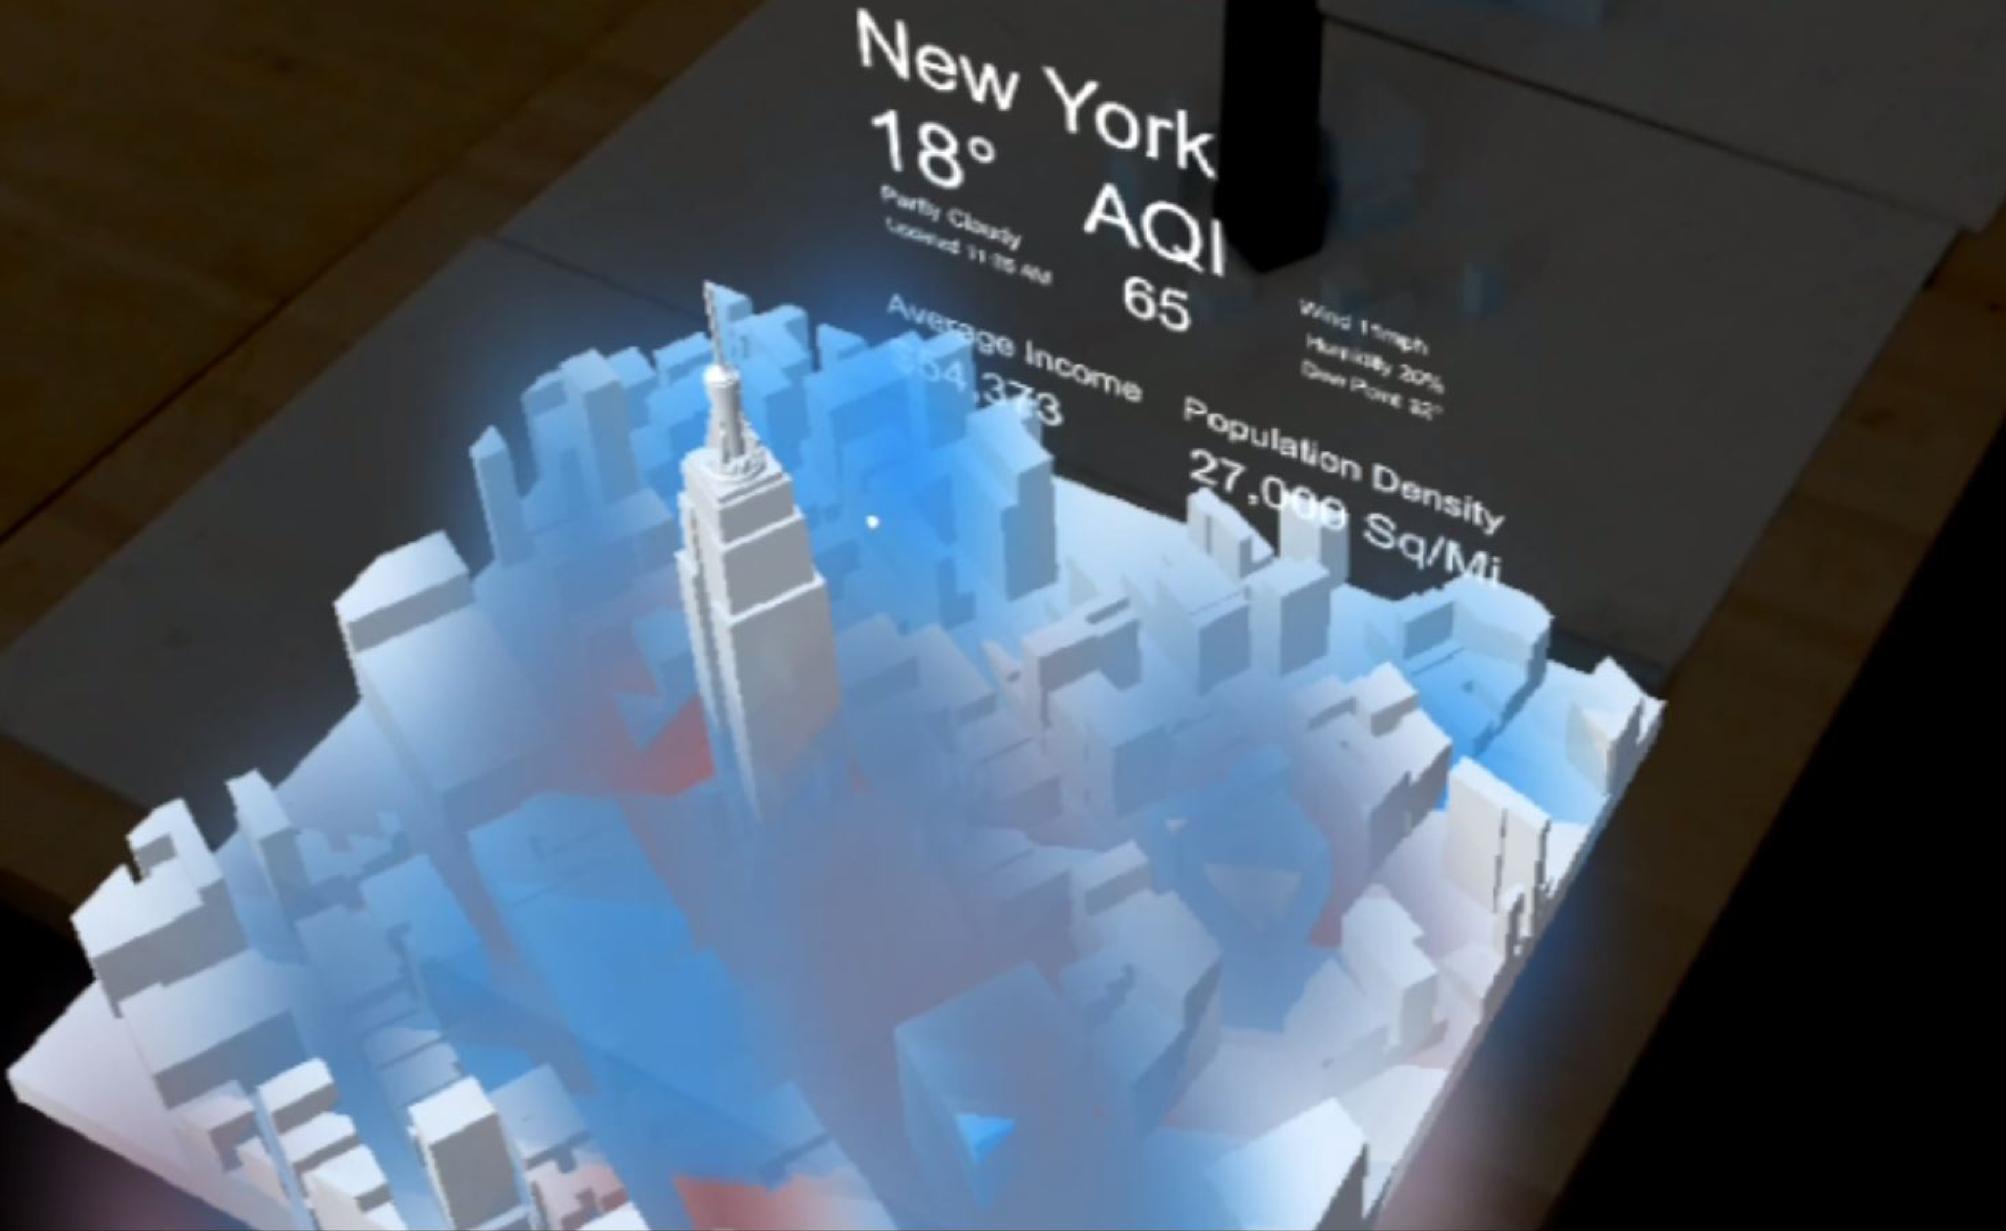 HUE, New York Air Quality visualization